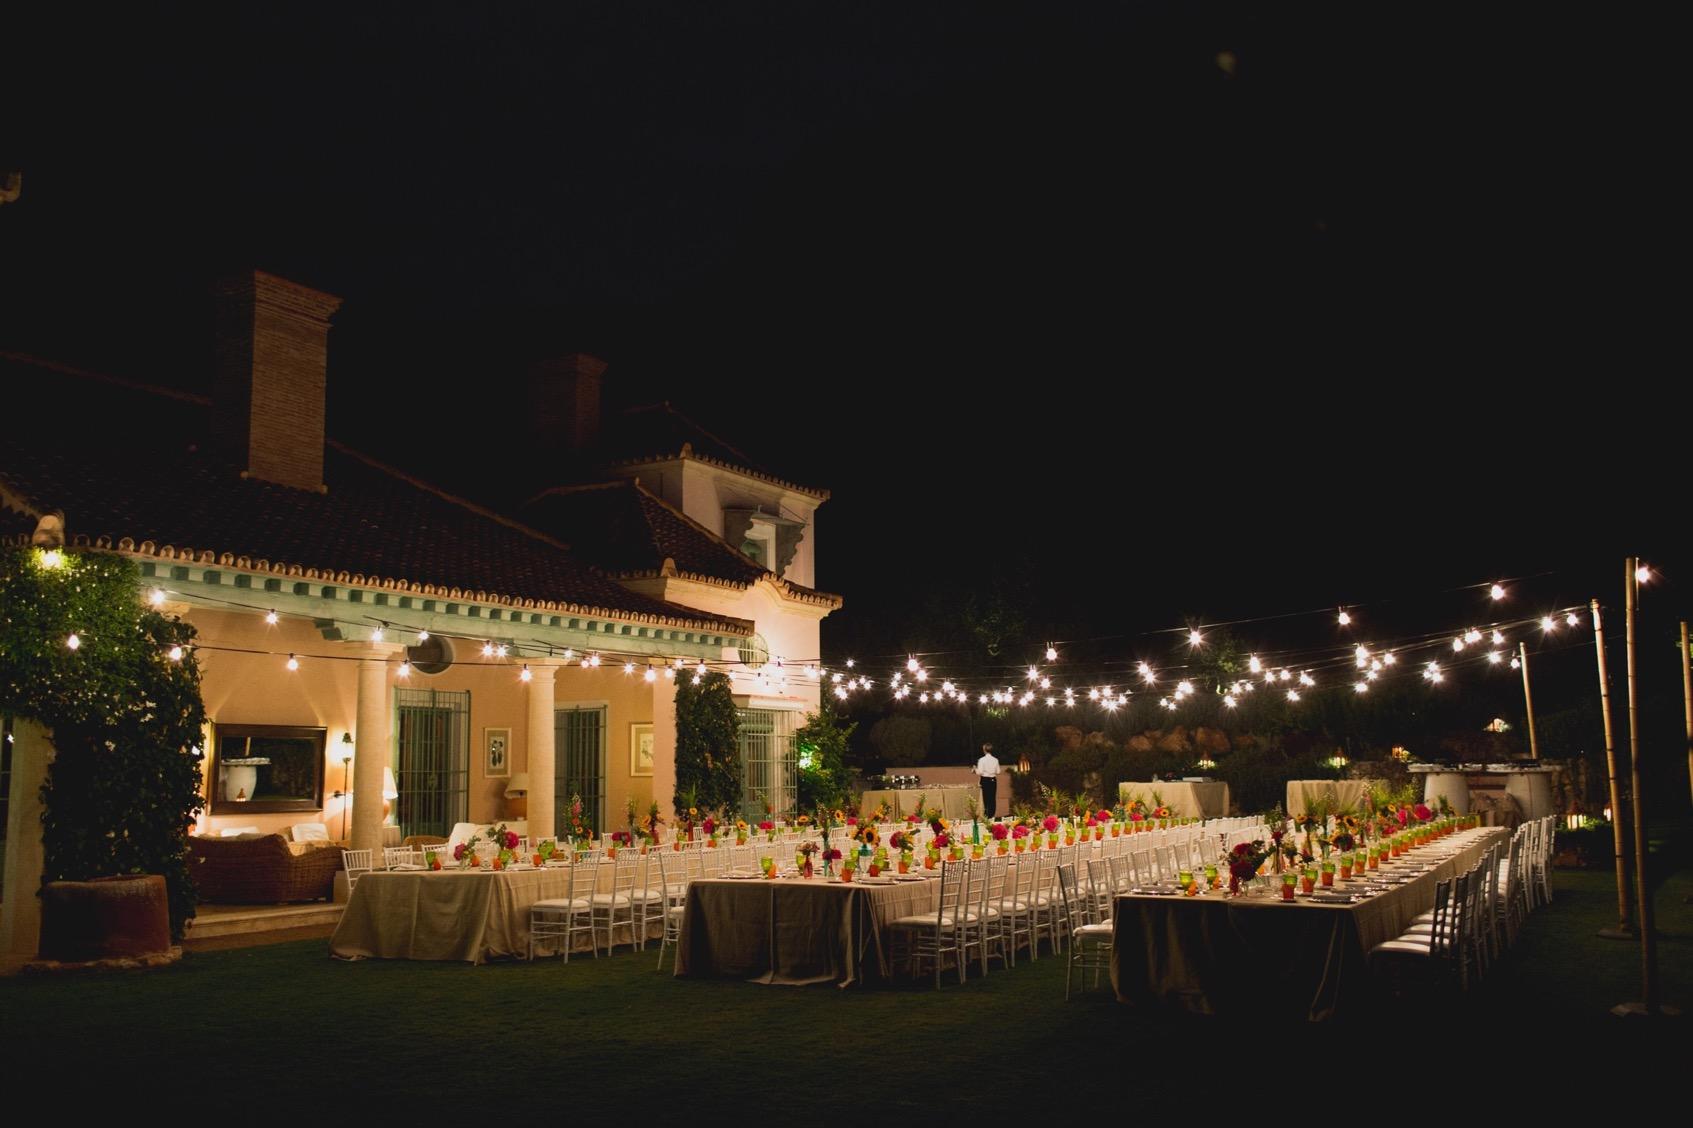 Si-Quiero-Wedding-Planner-By-Sira-Antequera-Bodas-Málaga-Marbella-Miami-Patricia-Juanlu-2